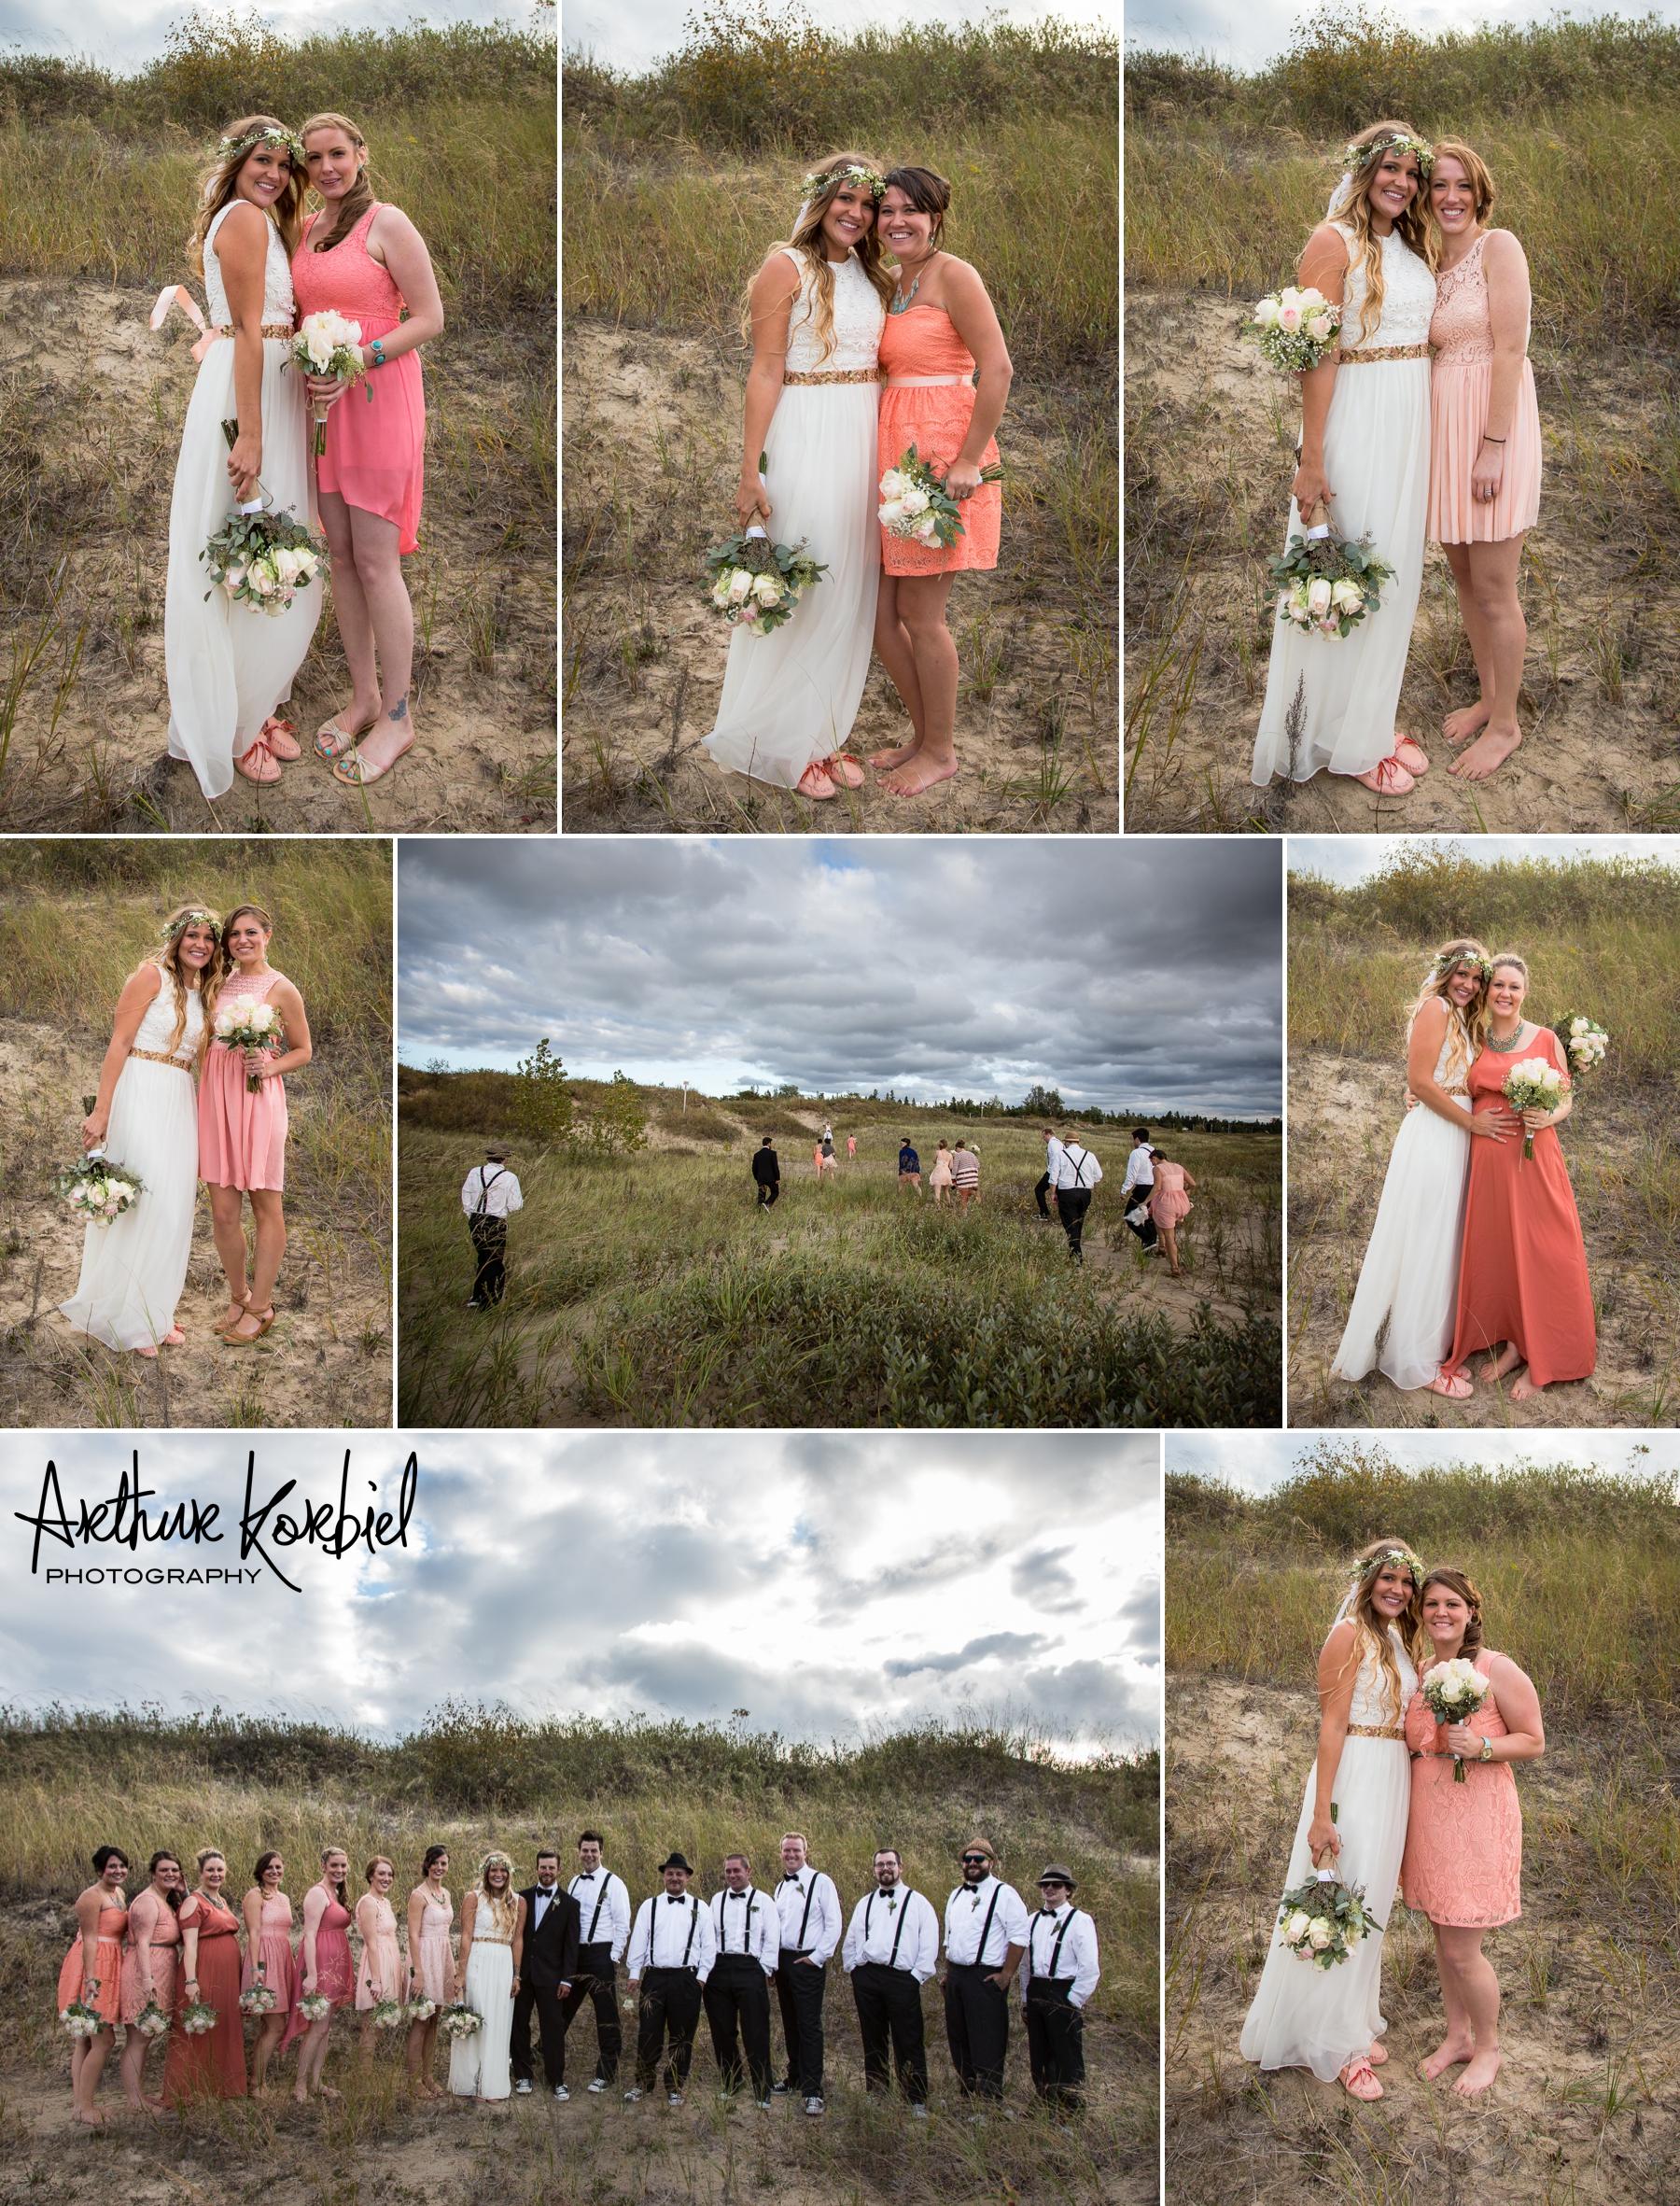 Arthur Korbiel Photography - London Engagement Photographer - Sauble Beach Barn Wedding - Samantha & Dan_009.jpg